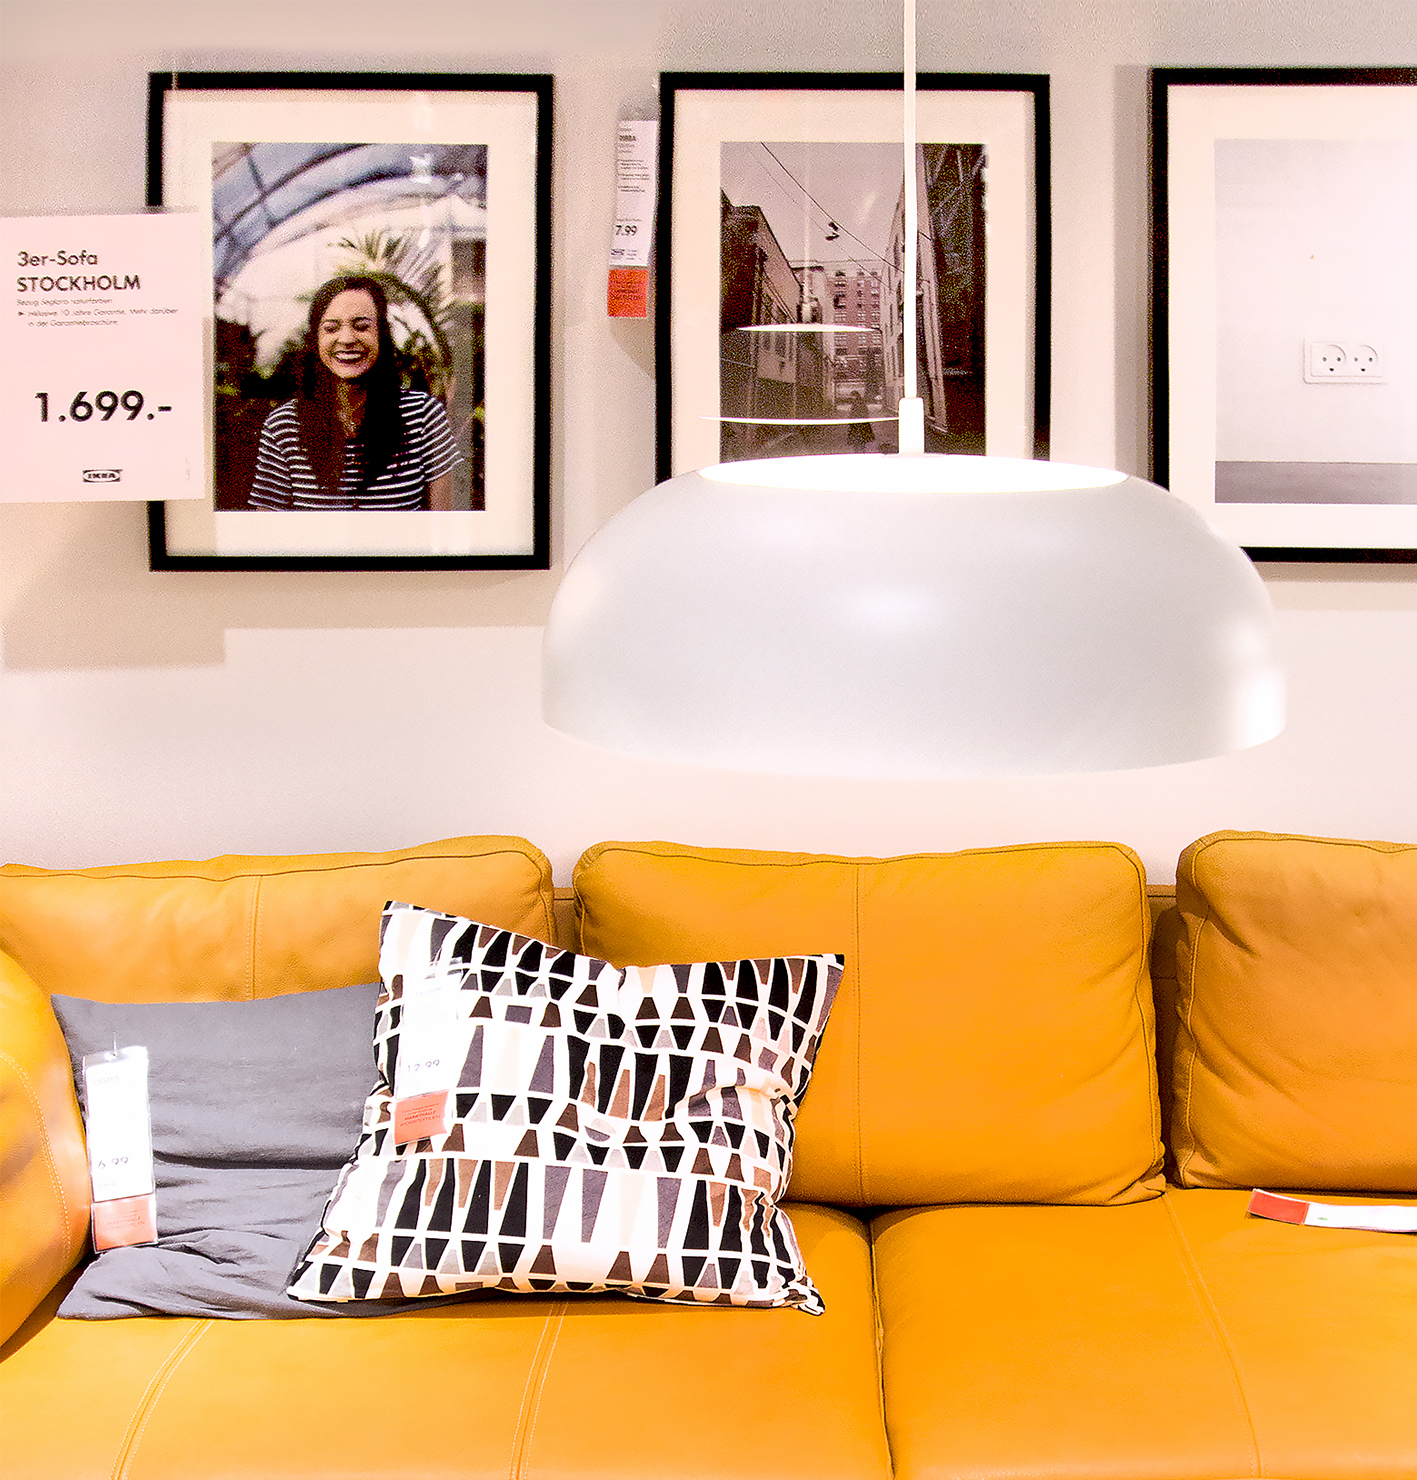 Ikea Scandy style